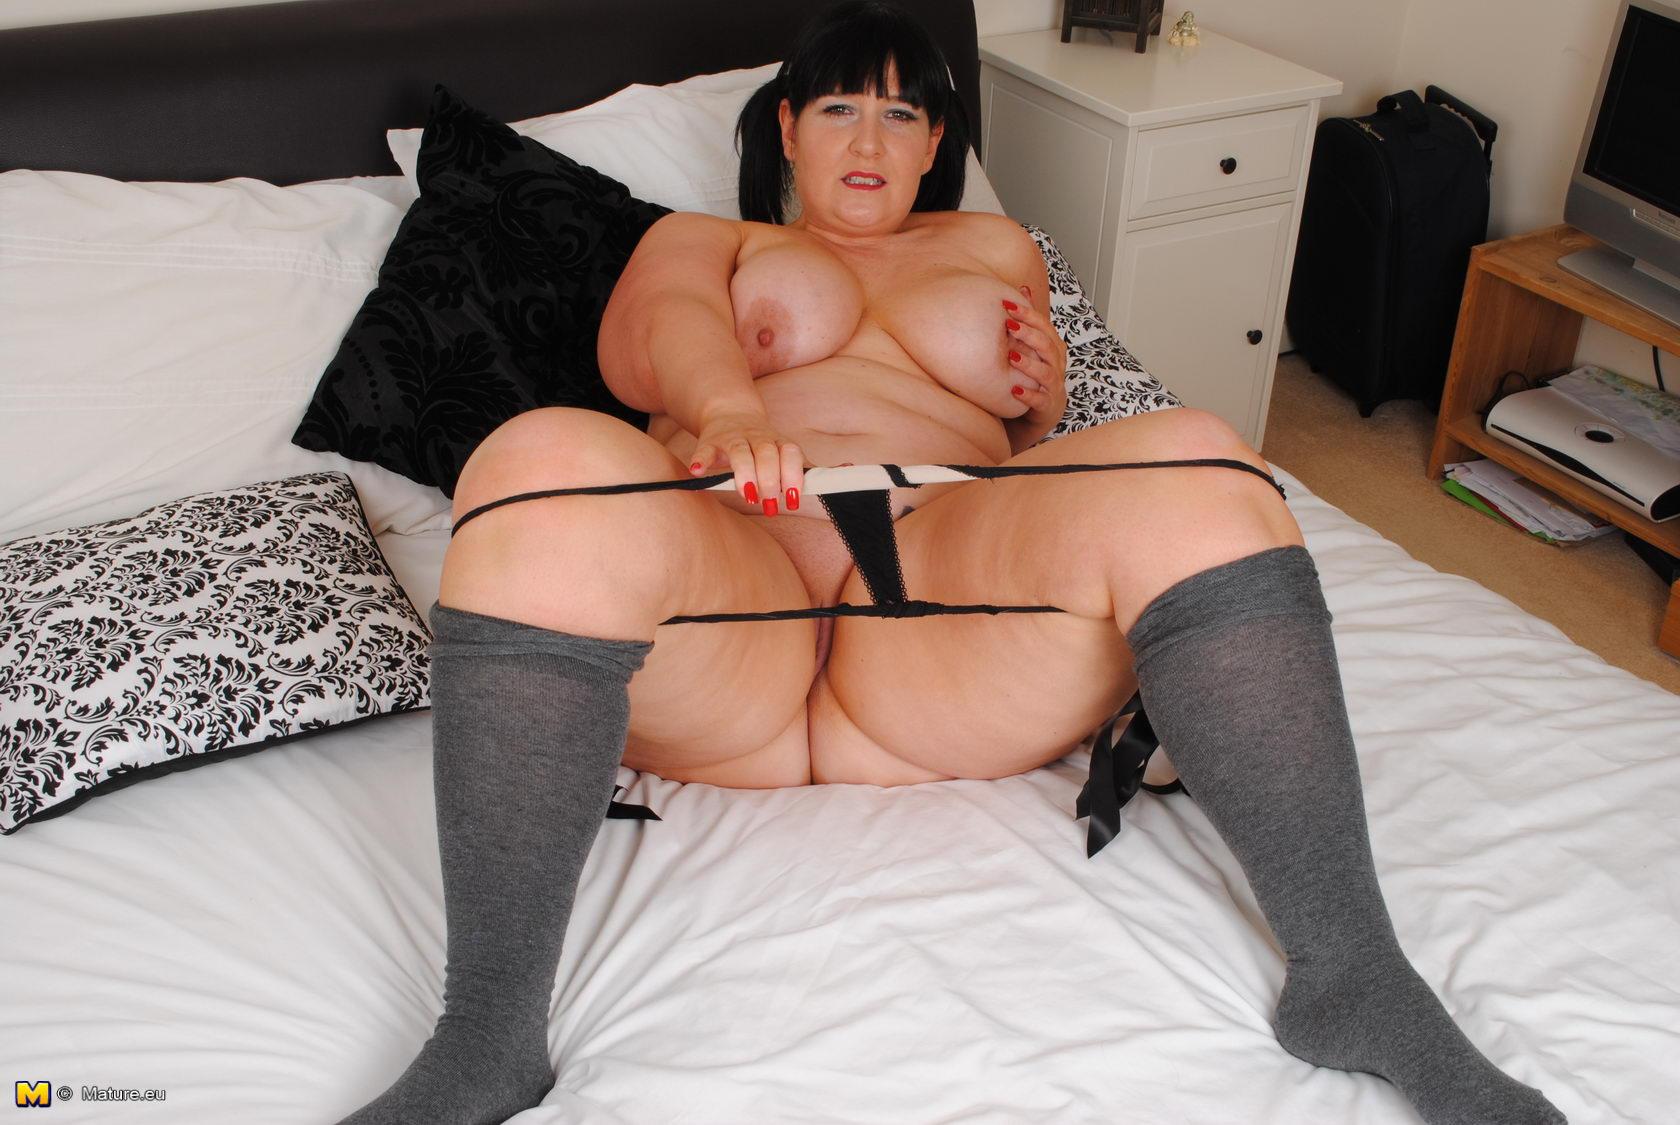 sex british Big having breasted images mature